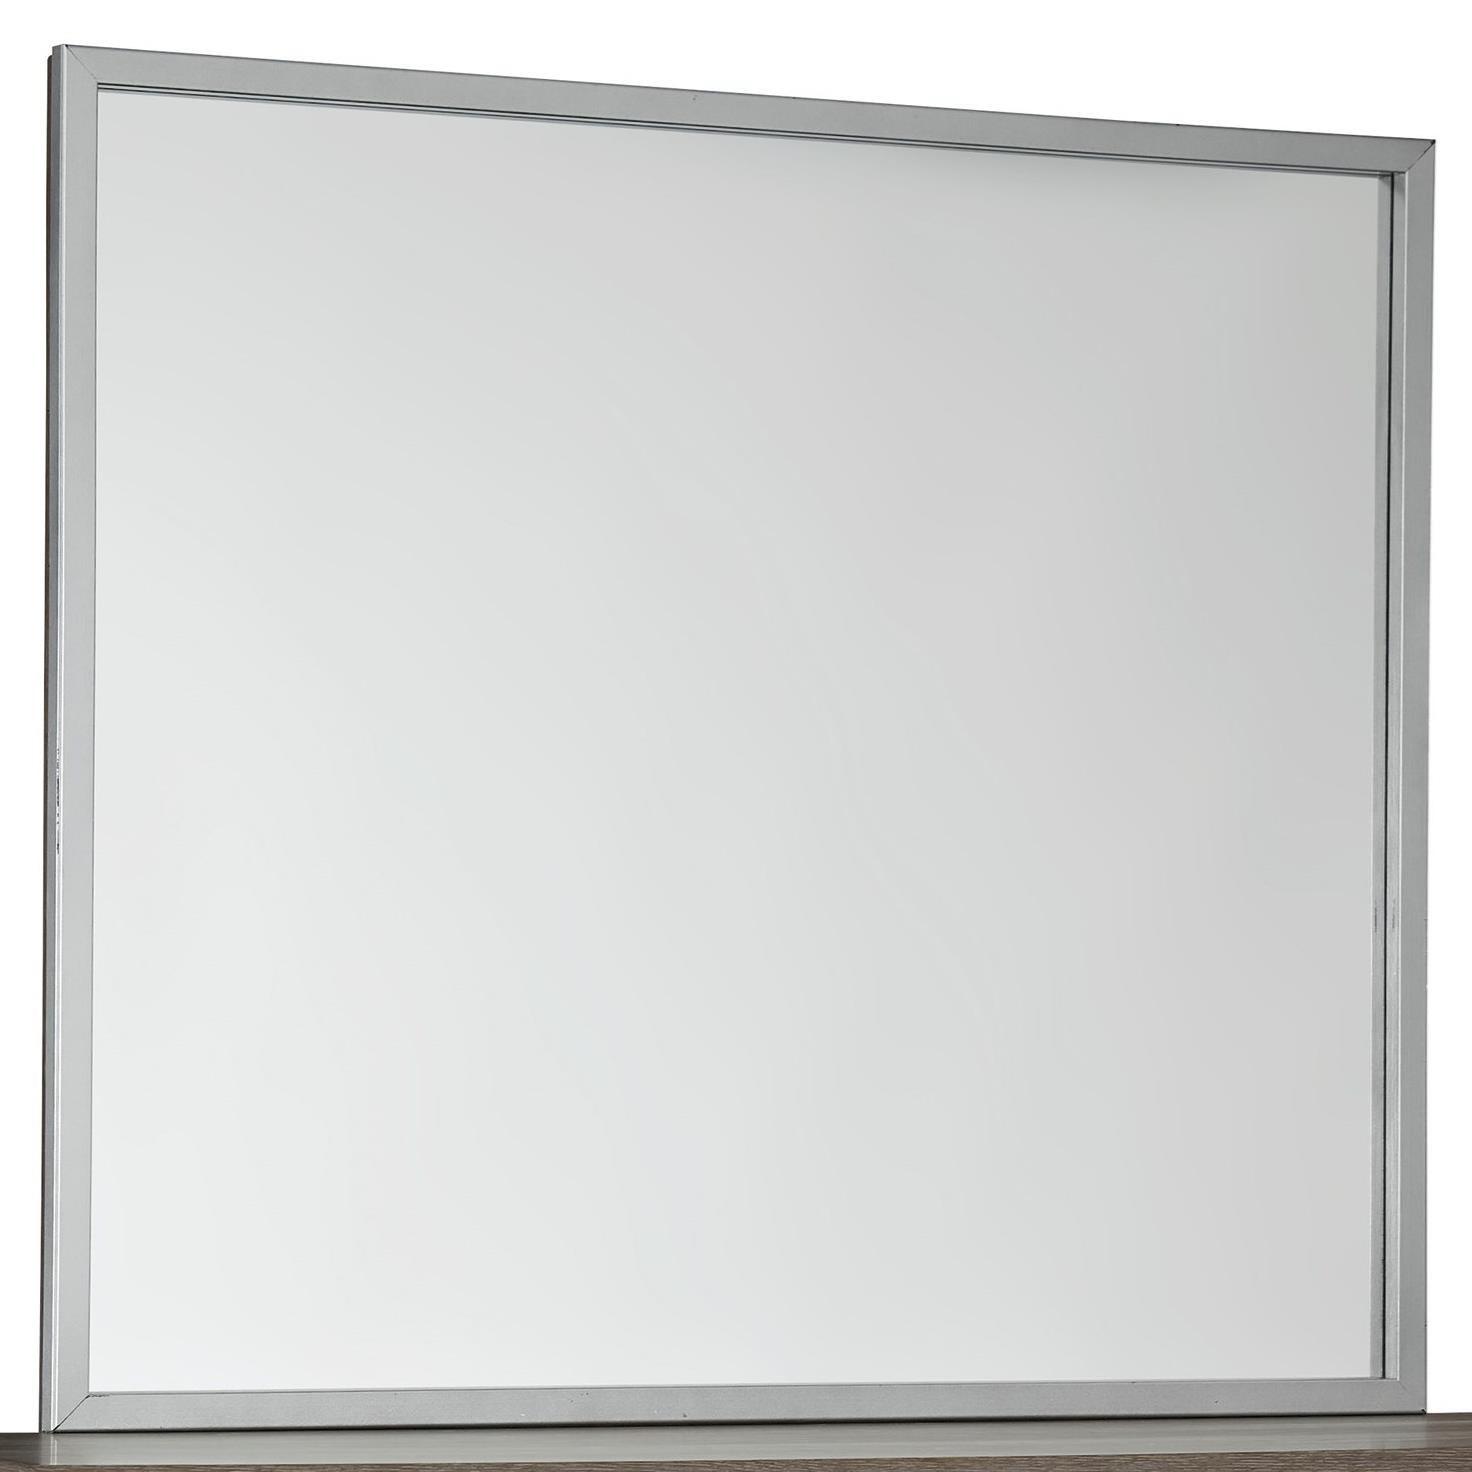 Signature Design by Ashley McKeeth Bedroom Mirror - Item Number: B099-26